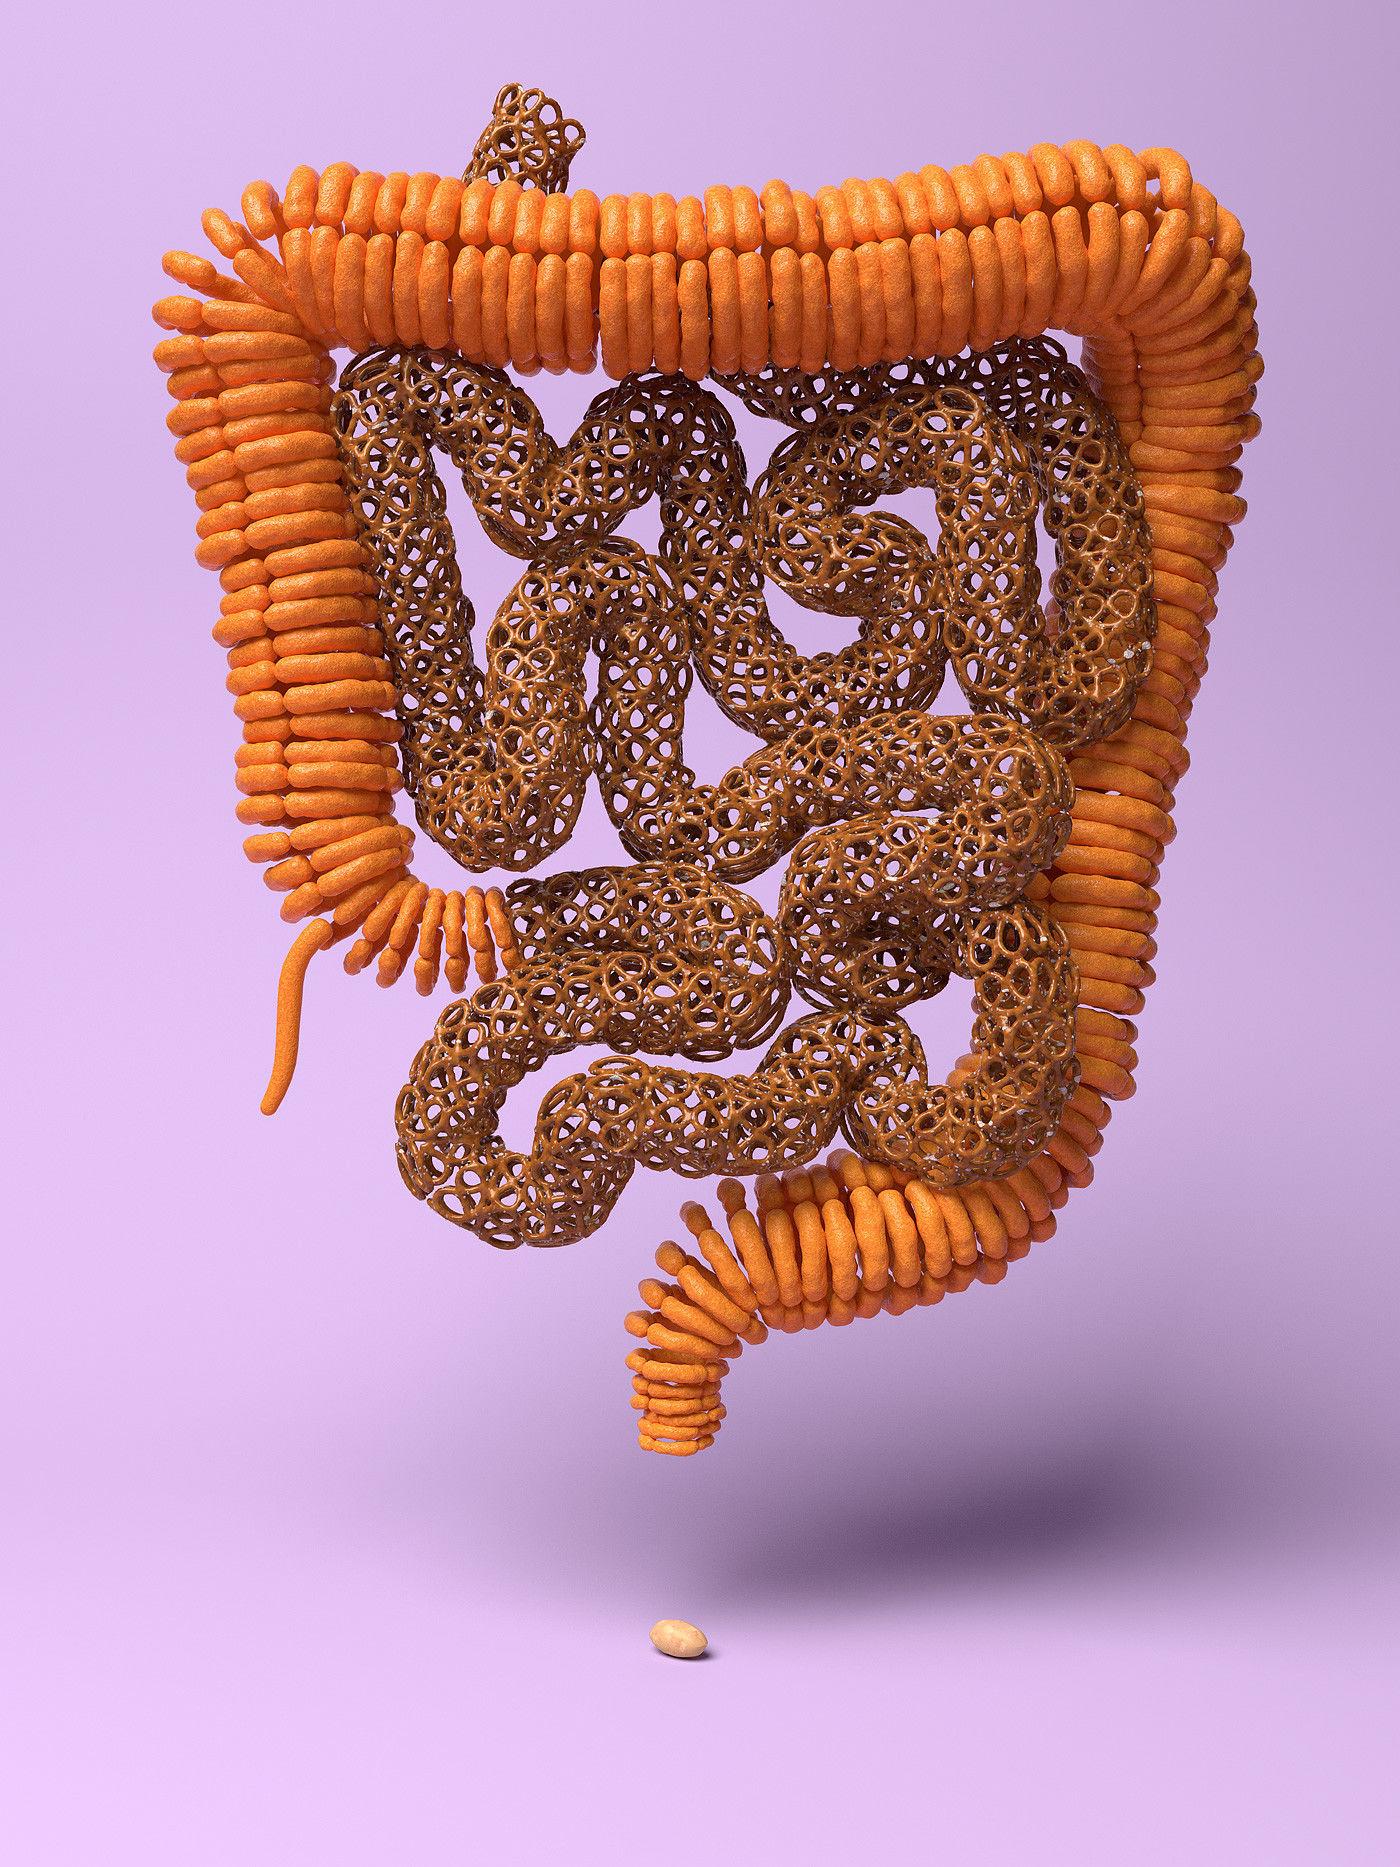 Organic Food - Salintestines